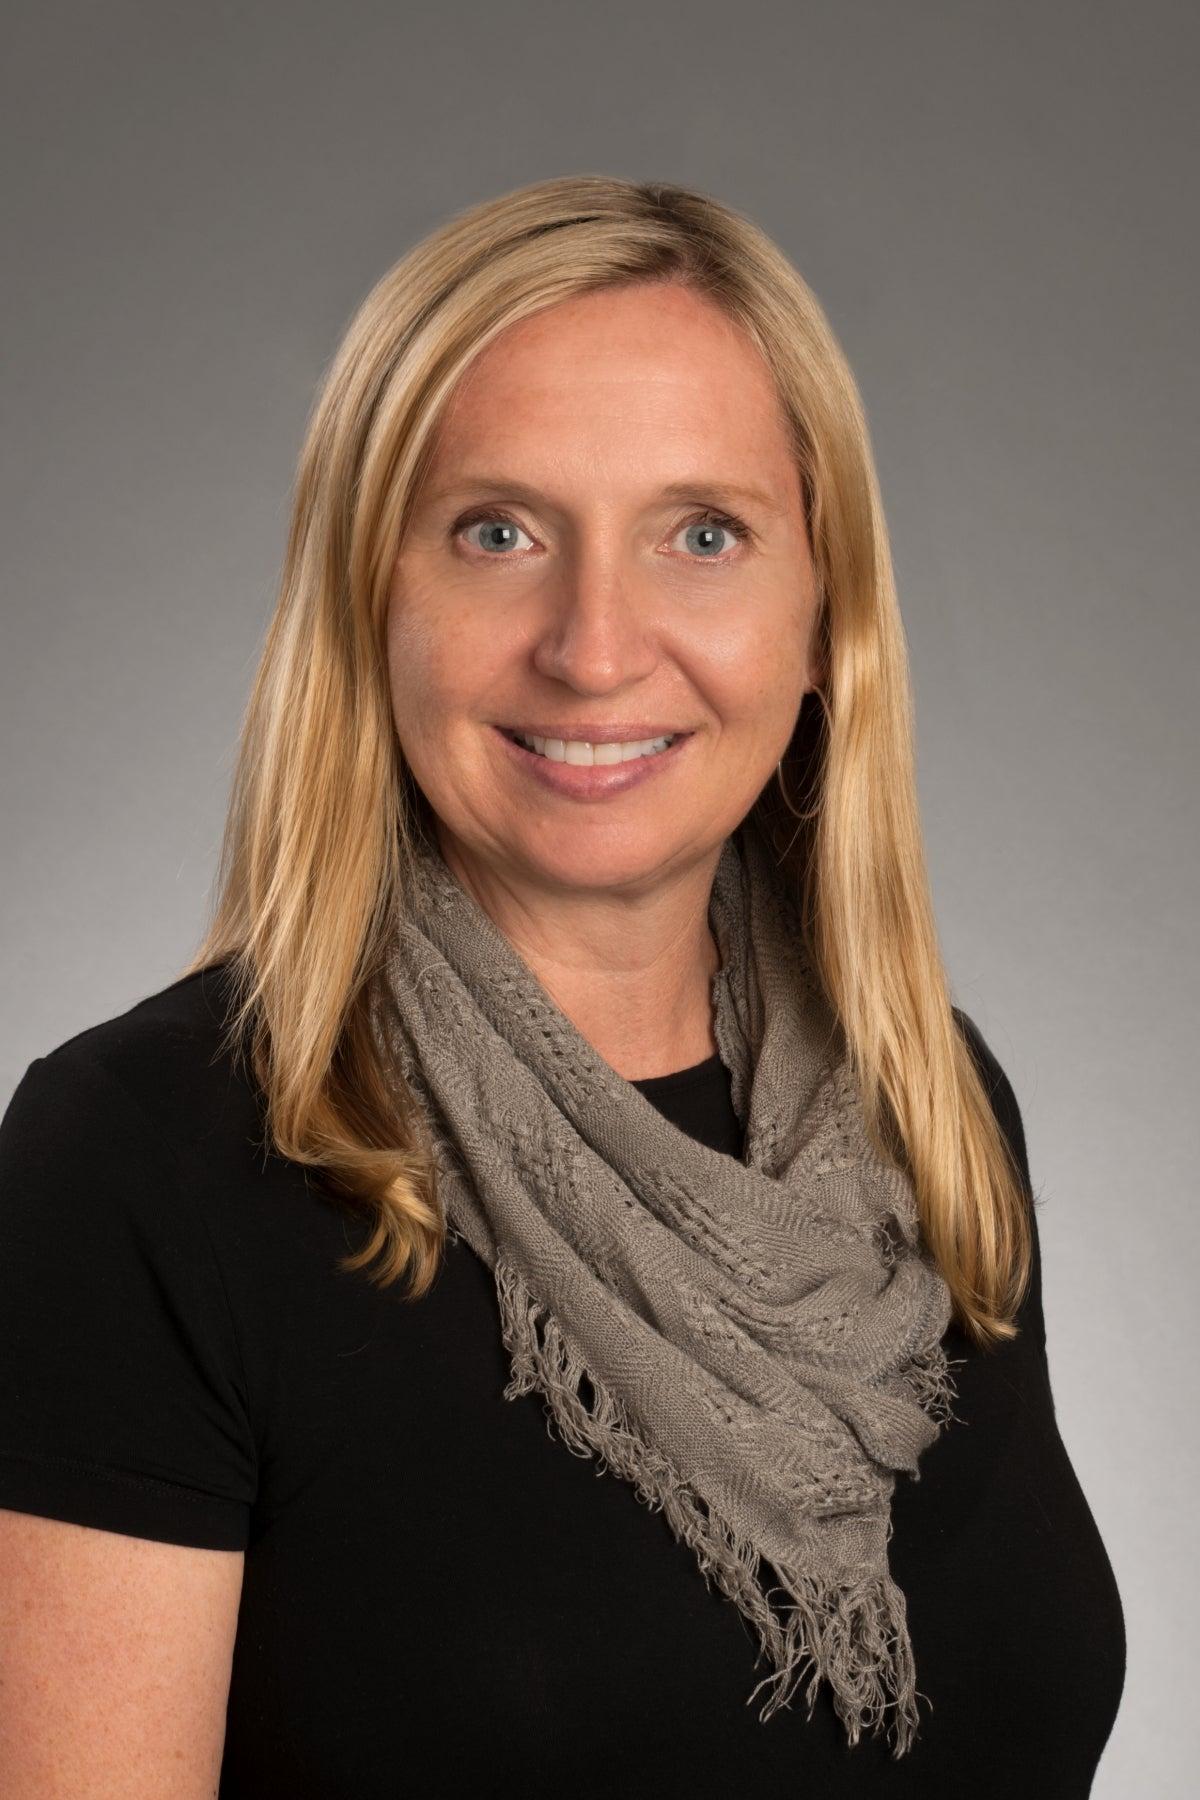 Jennifer Obenshain, Social Work, Faculty/Staff, studio portrait